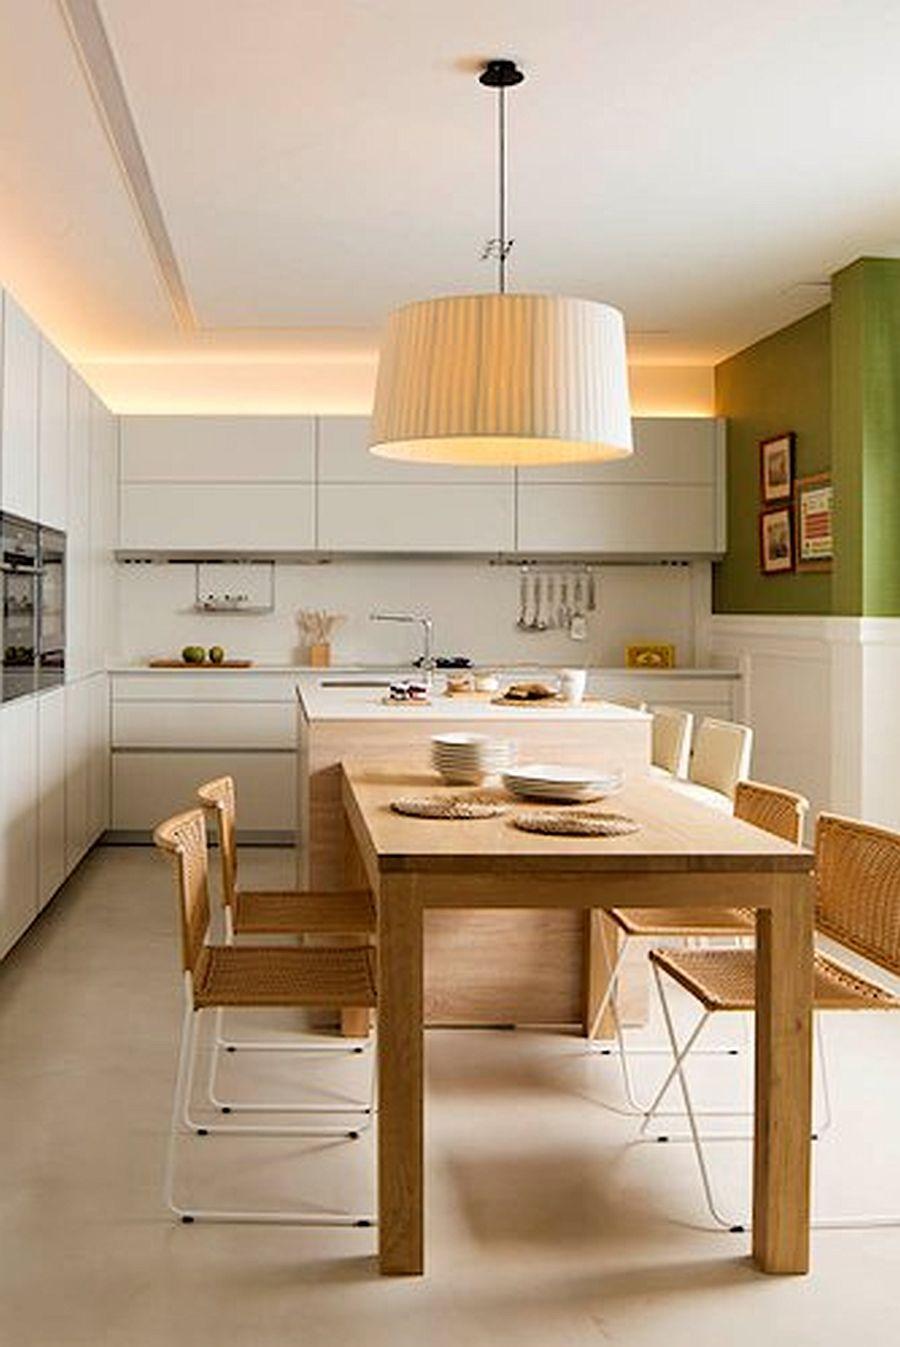 adelaparvu.com despre renovare apartament in cladire veche, casa Barcelona, designer Meritxell Ribe (21)